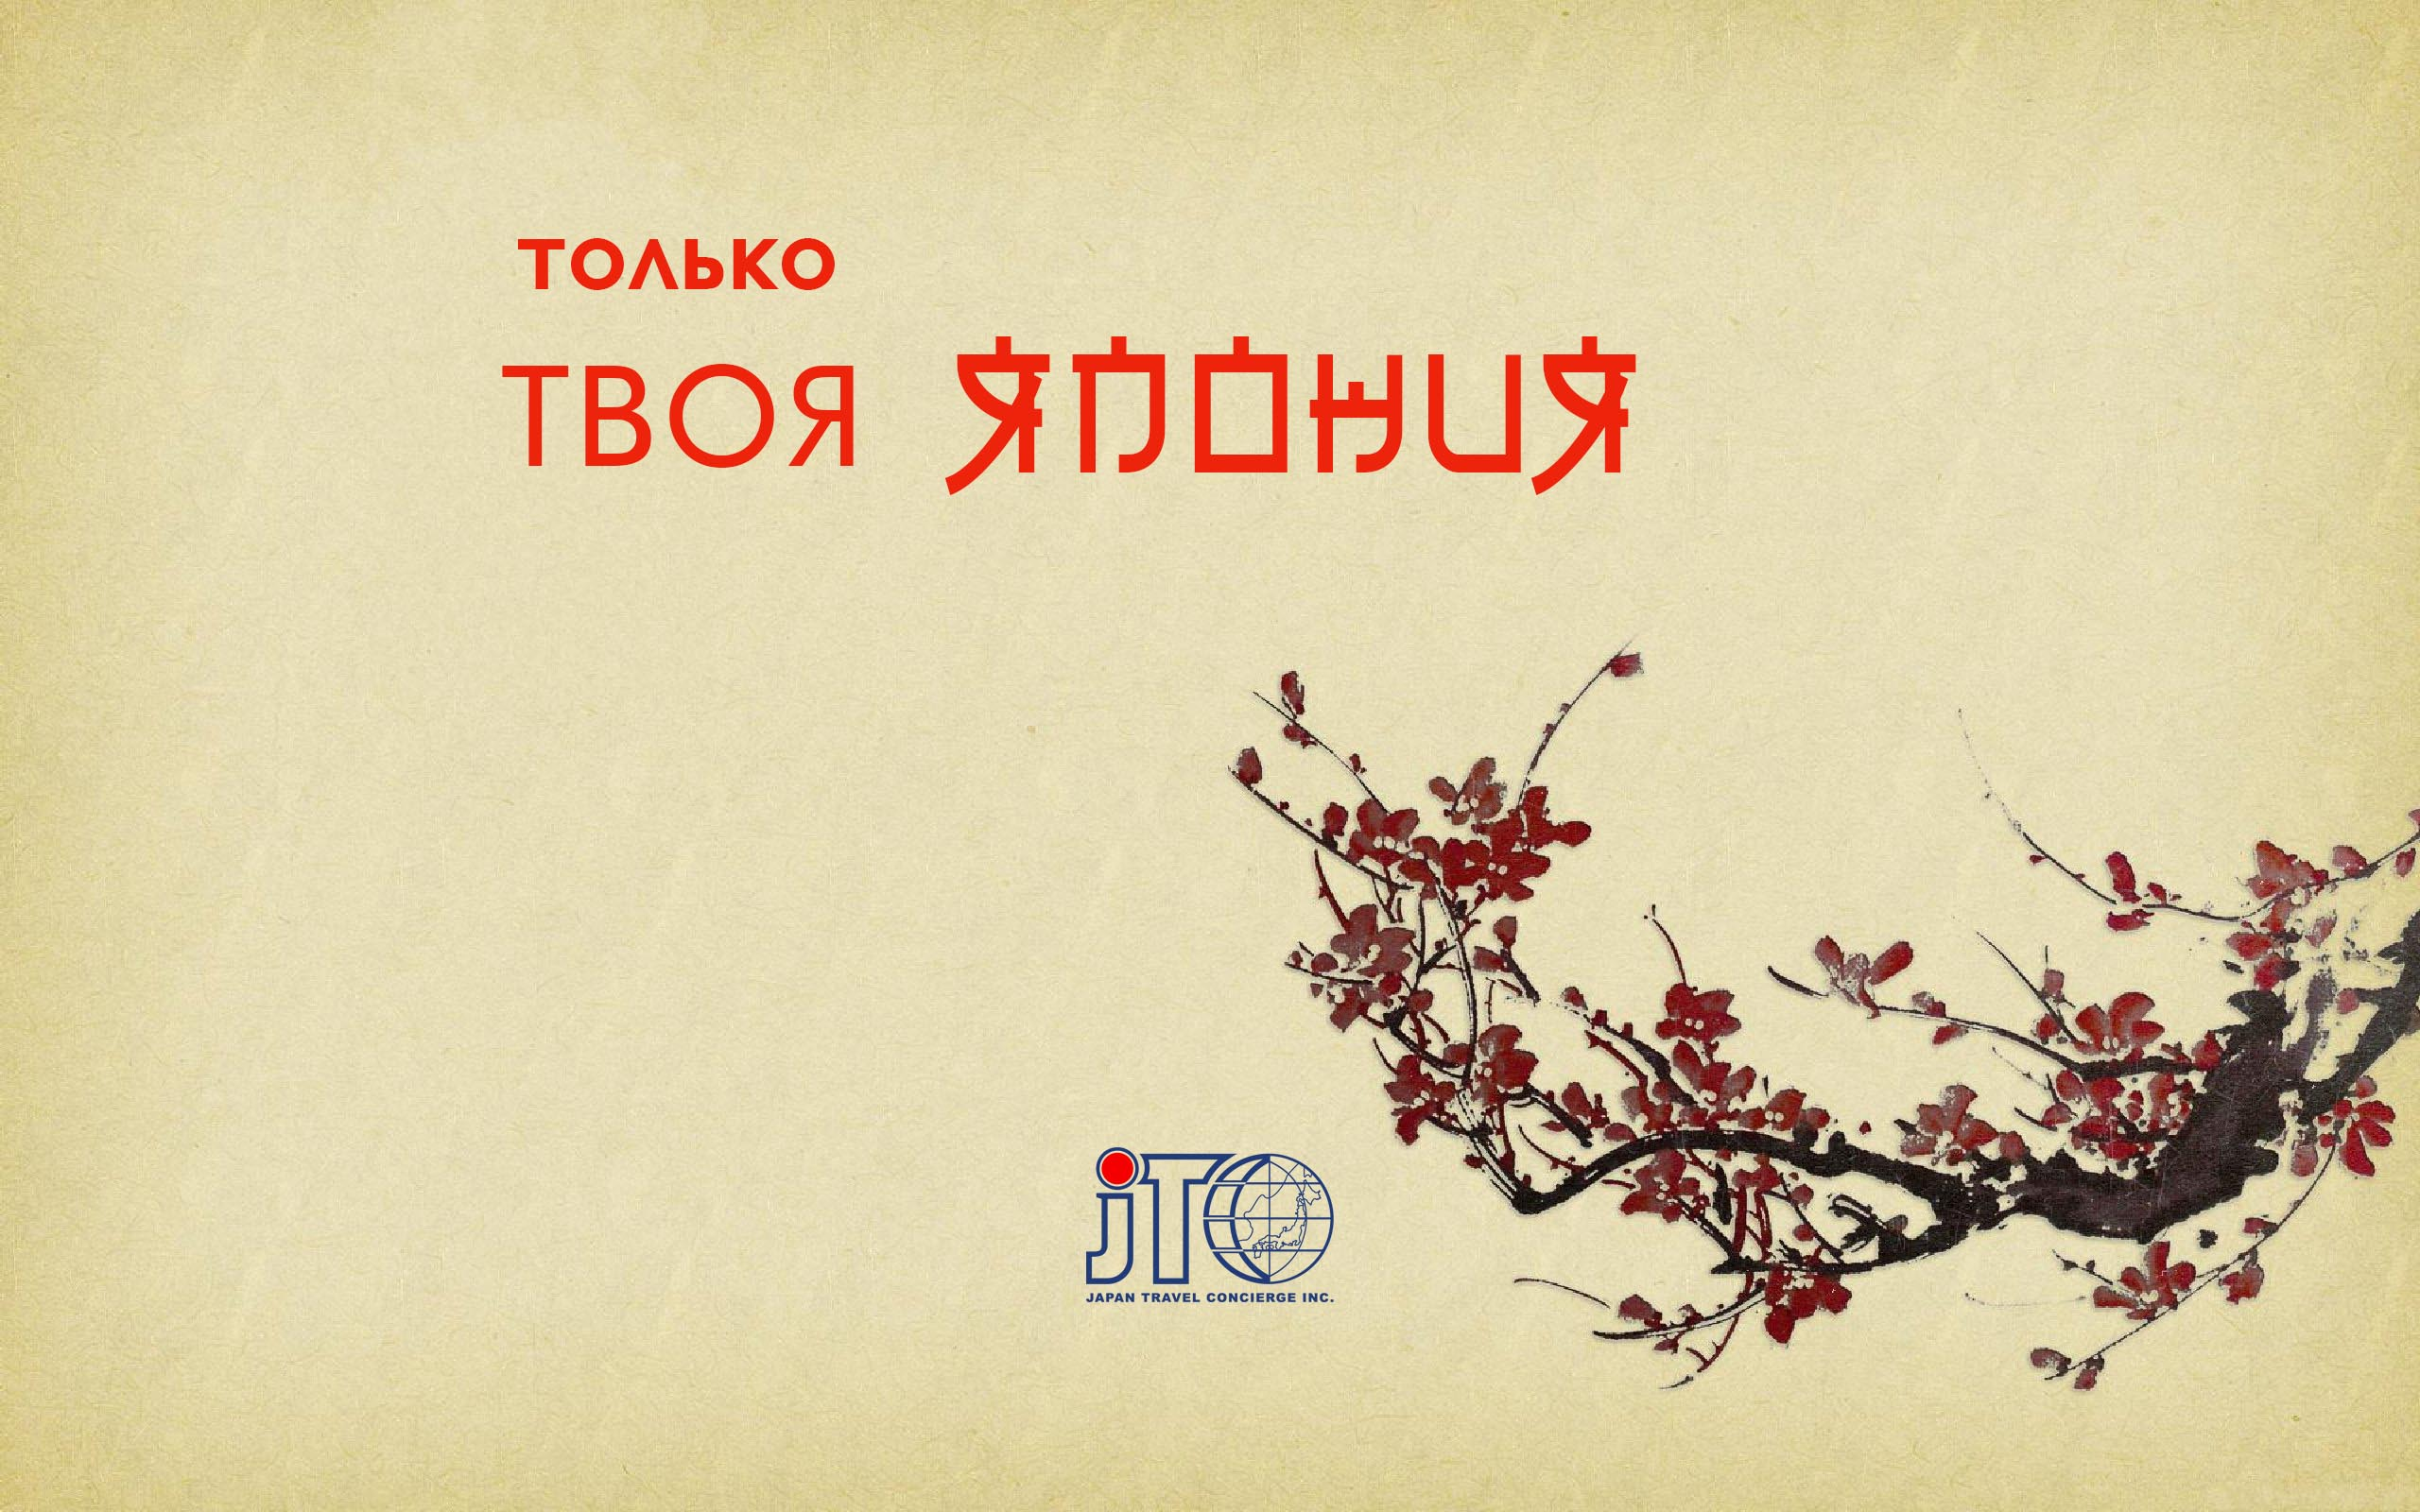 Обложки в соц. сети для тур. оператора по Японии фото f_42159b9693e82d62.jpg